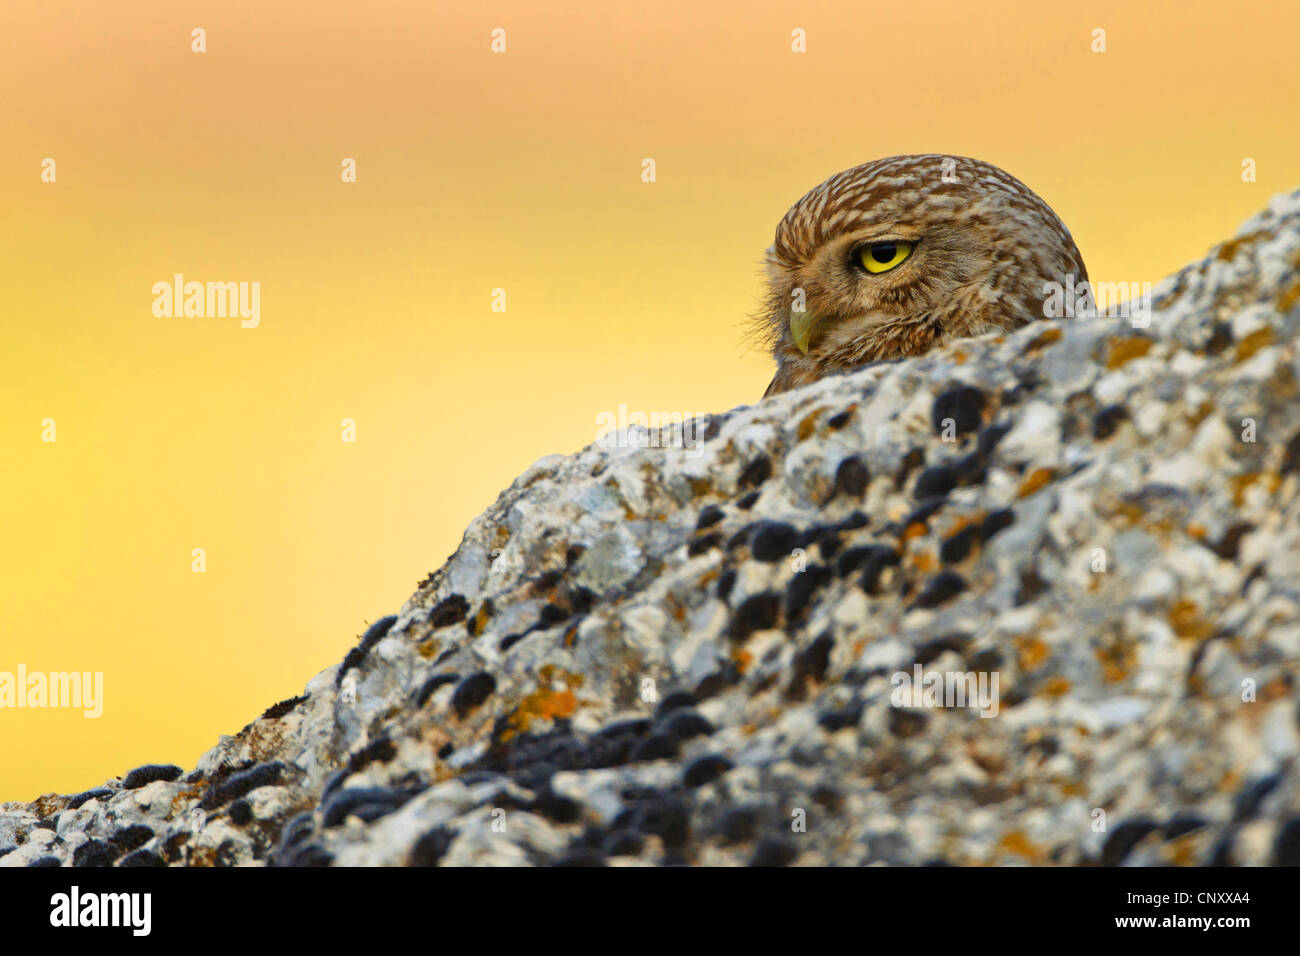 little owl (Athene noctua), peering from behind a rock, Turkey, Sanliurfa - Stock Image